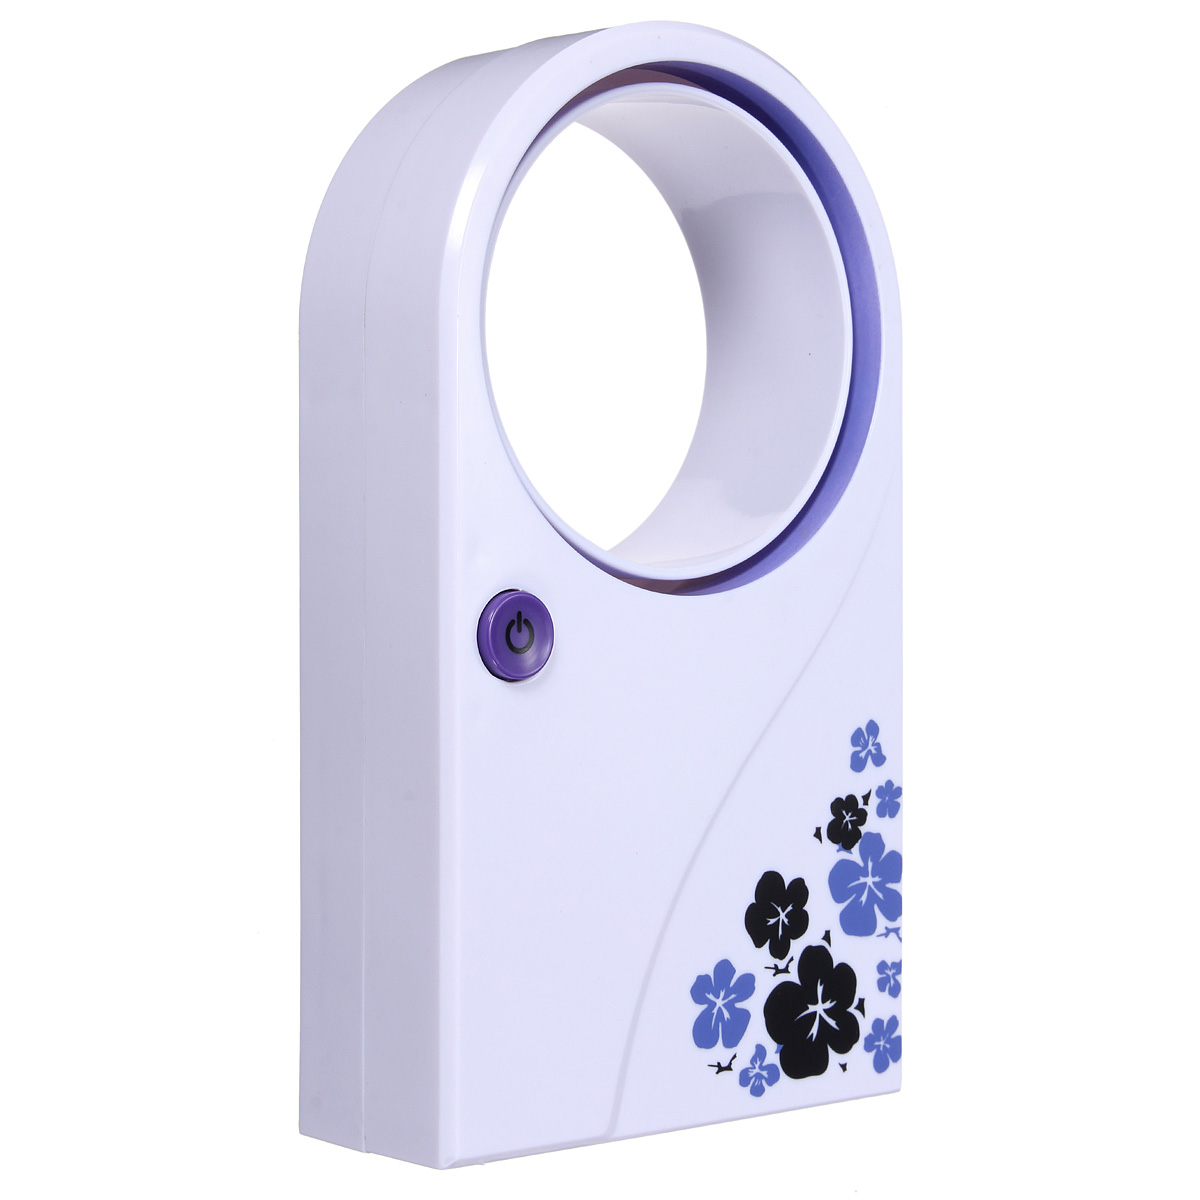 No Leaf Mini Handheld Desk Stand Silent Air Conditioner